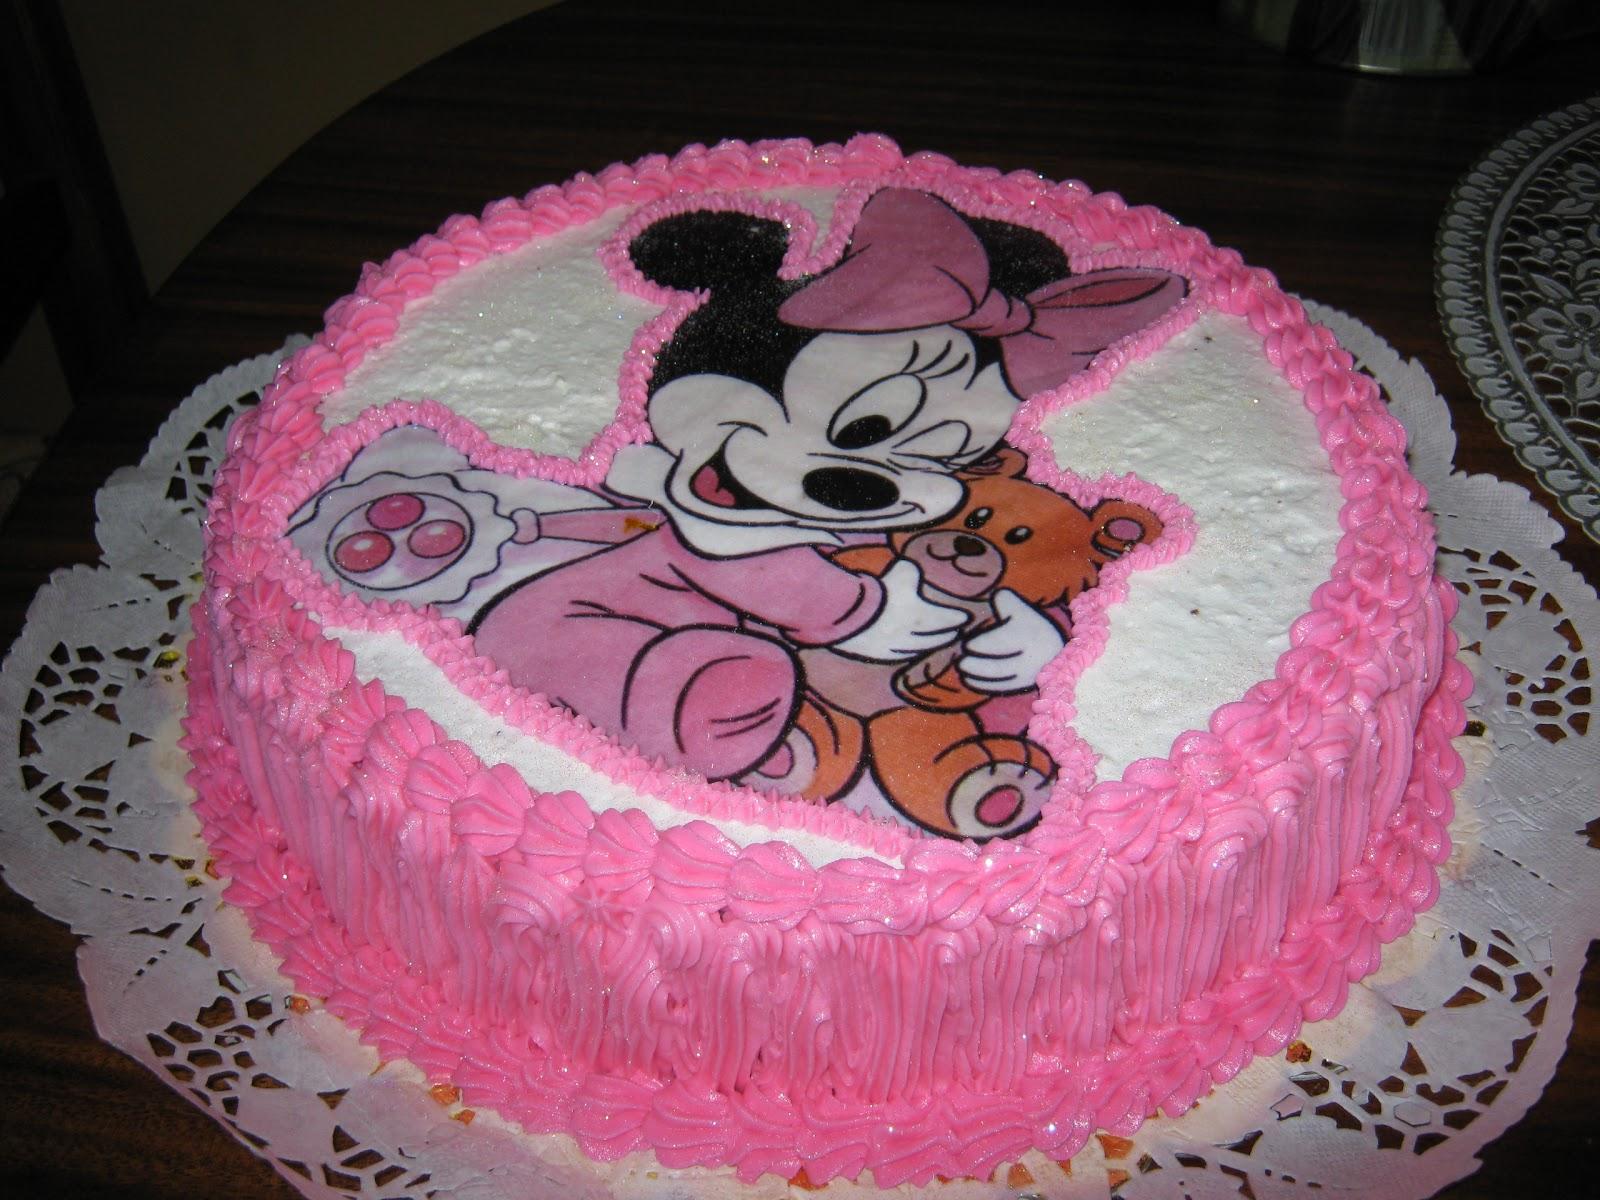 Modelos de tortas de Minnie Mouse - Imagui